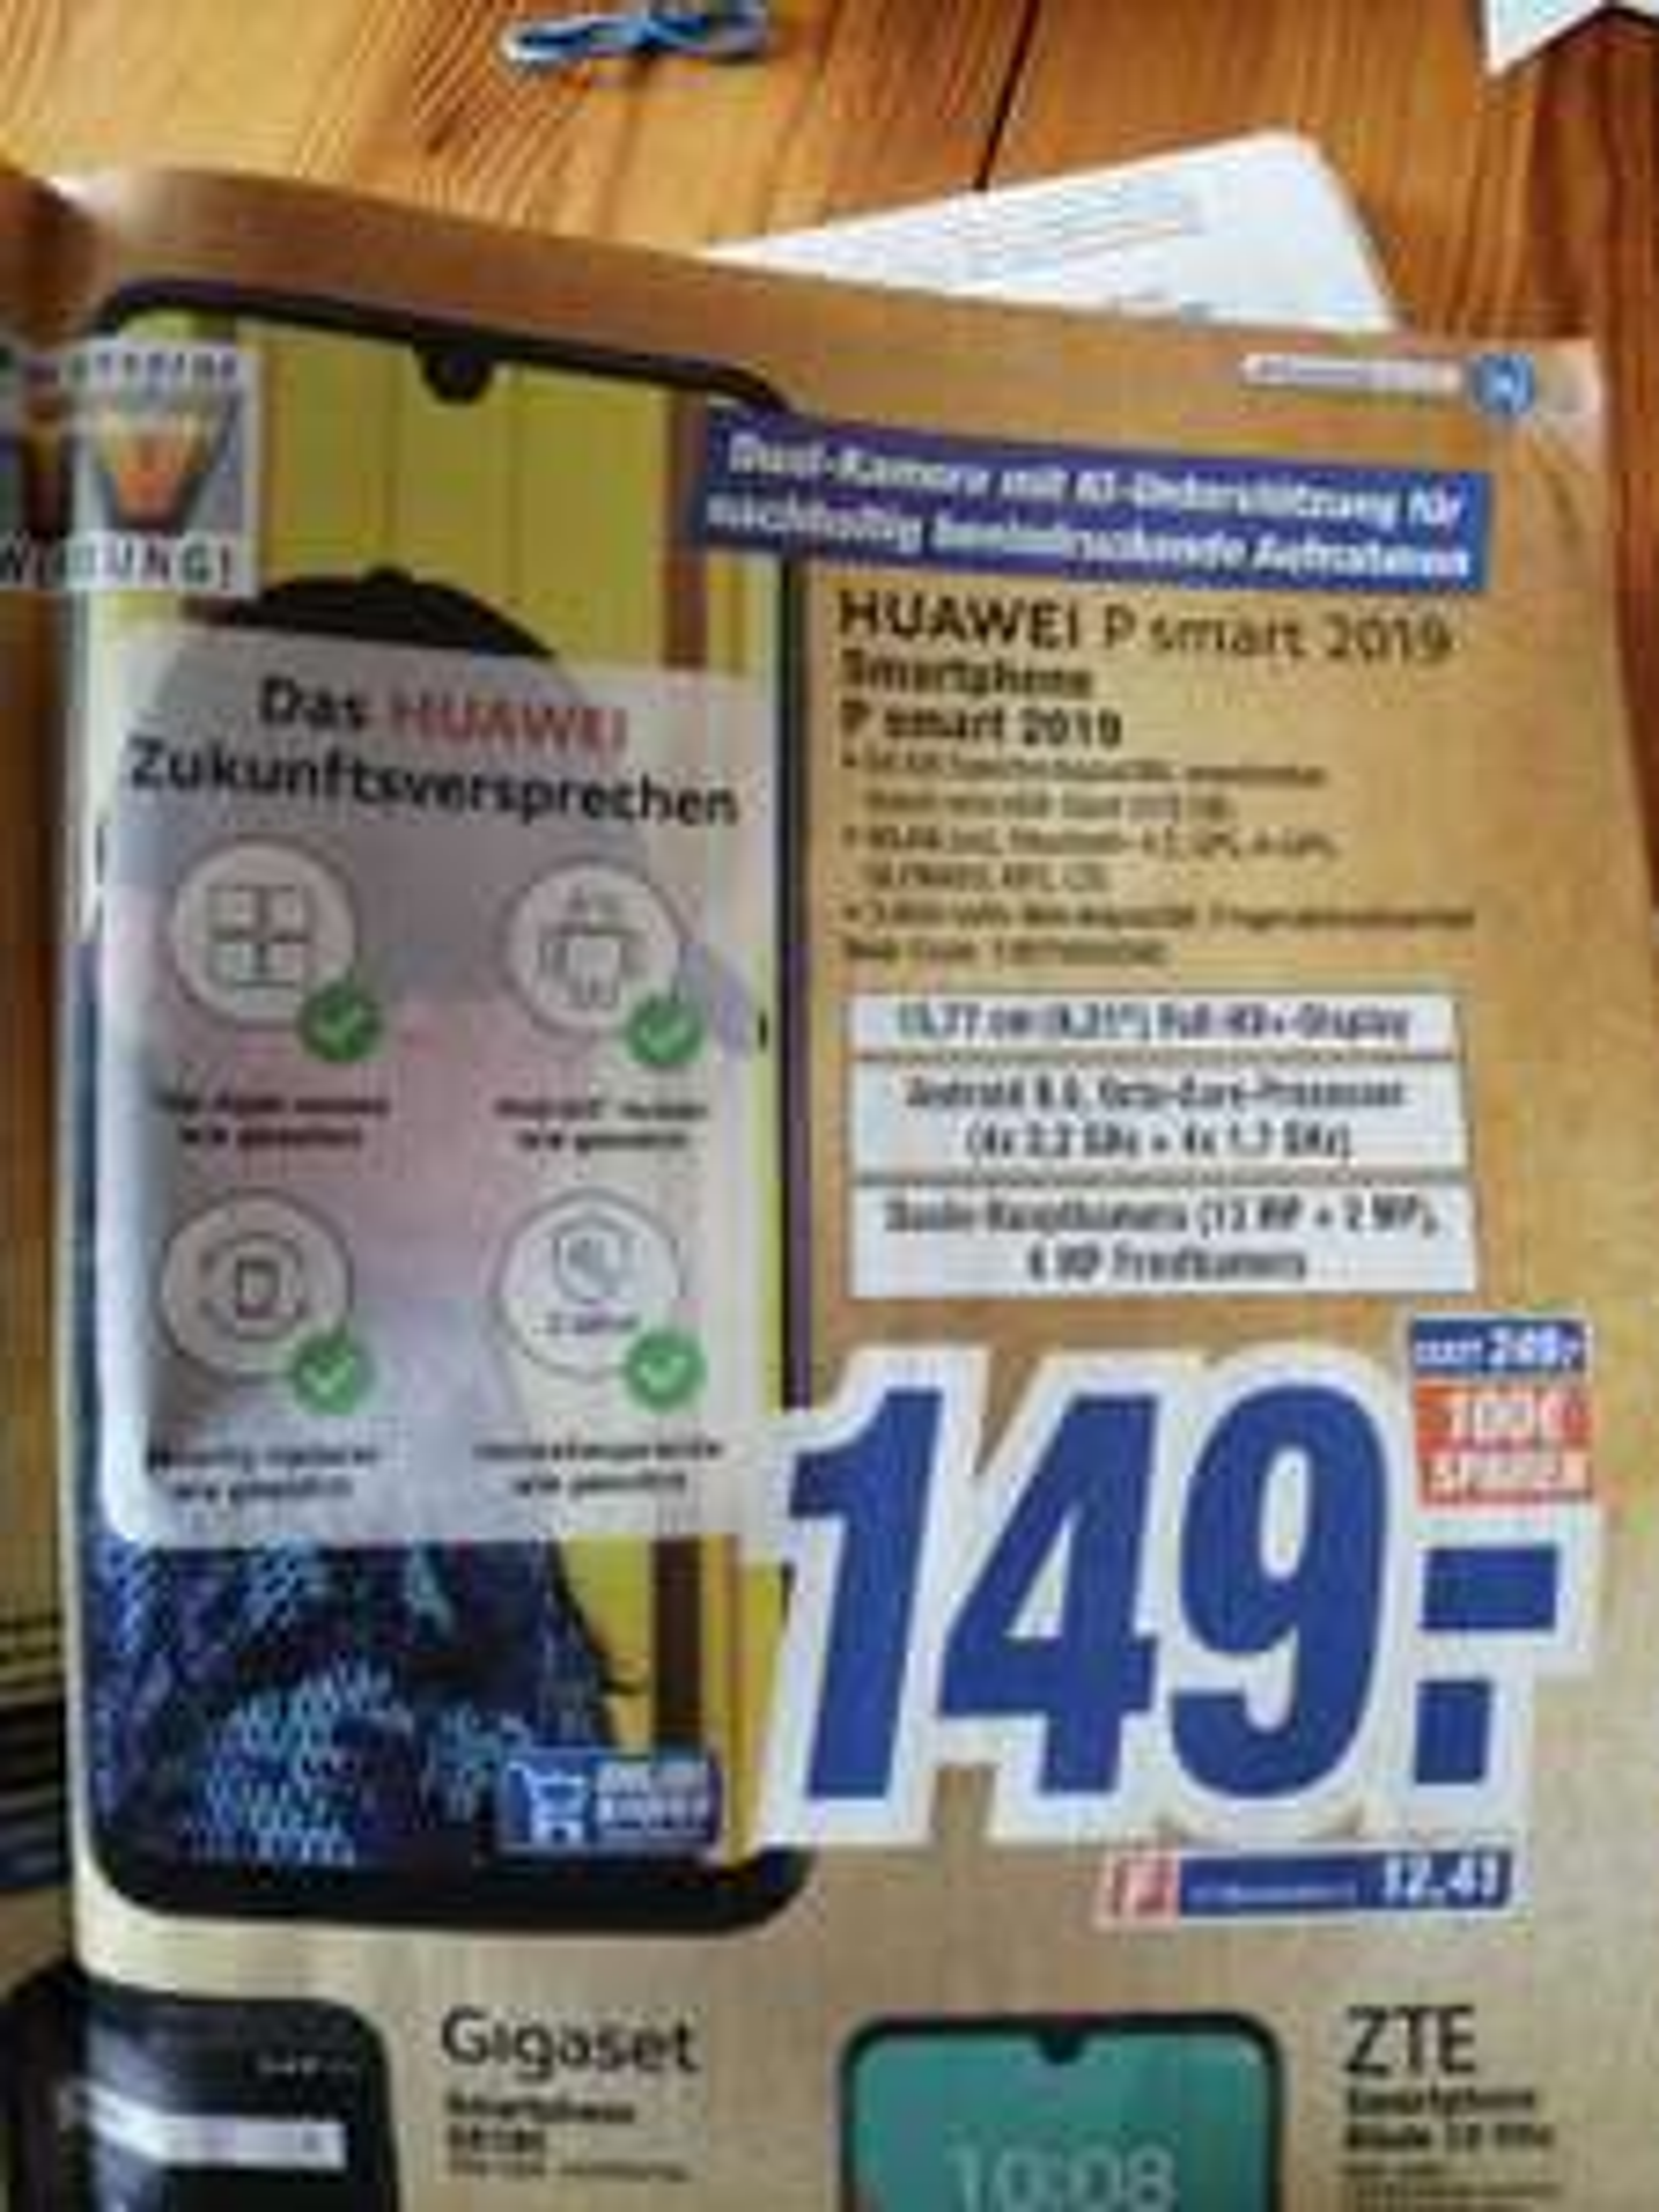 Huawei P smart 2019 bei HEM